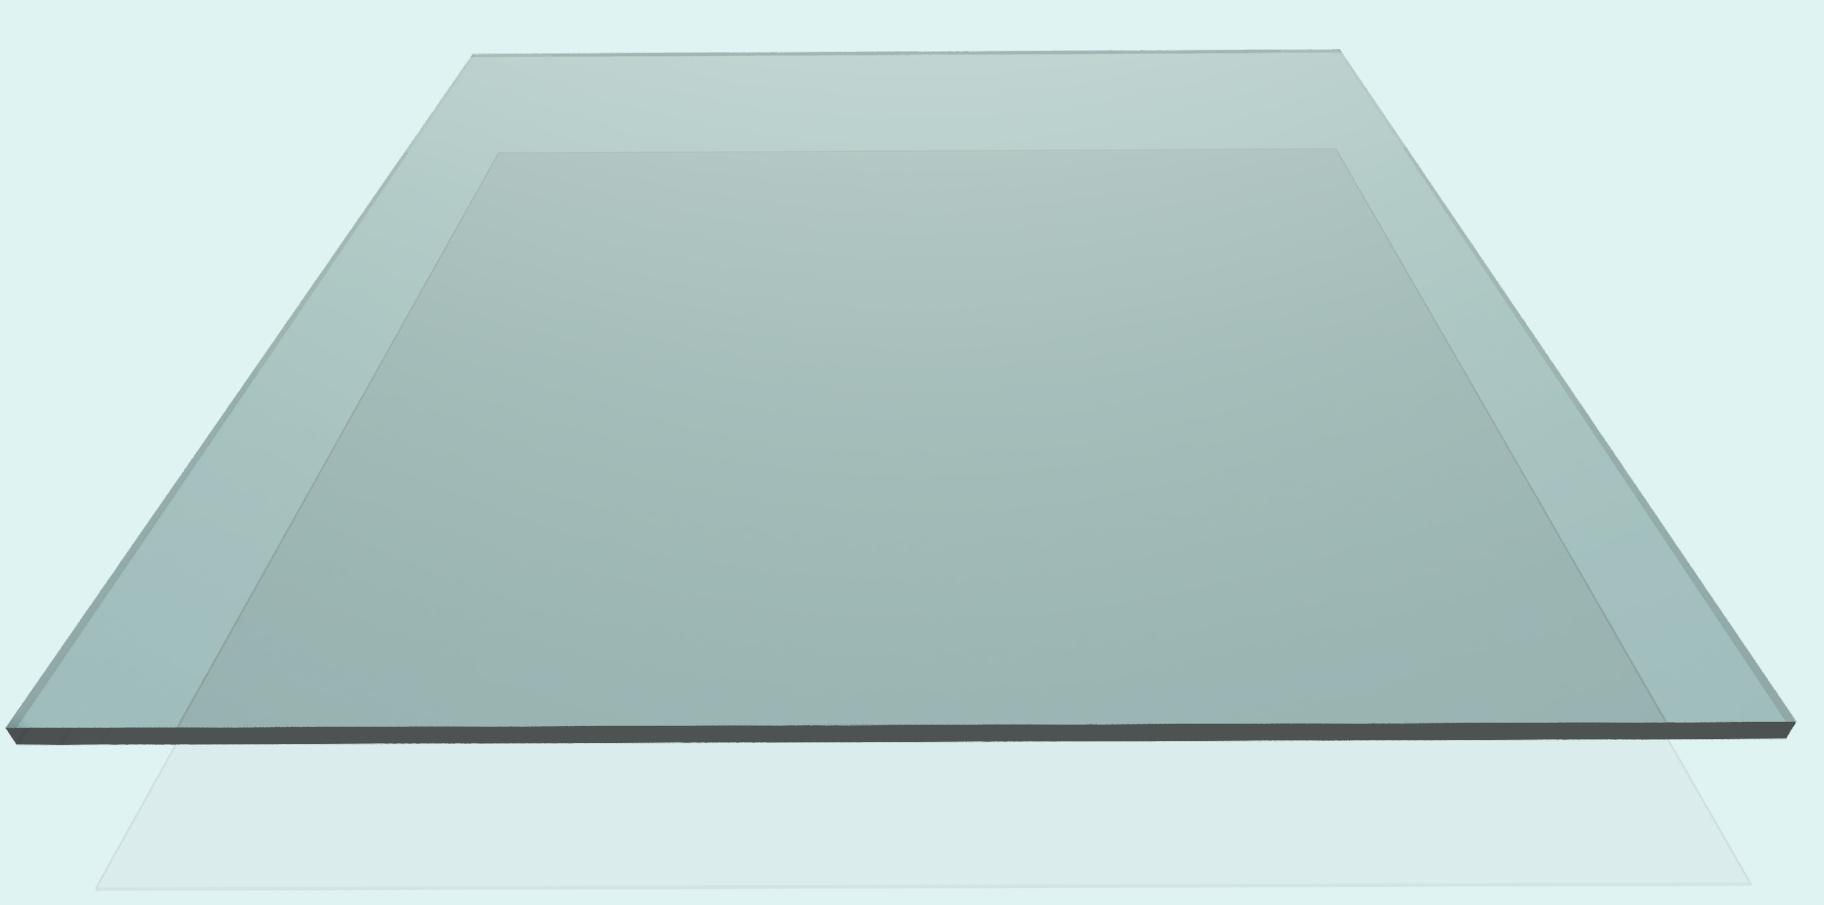 Polycarbonat 3 mm, klar